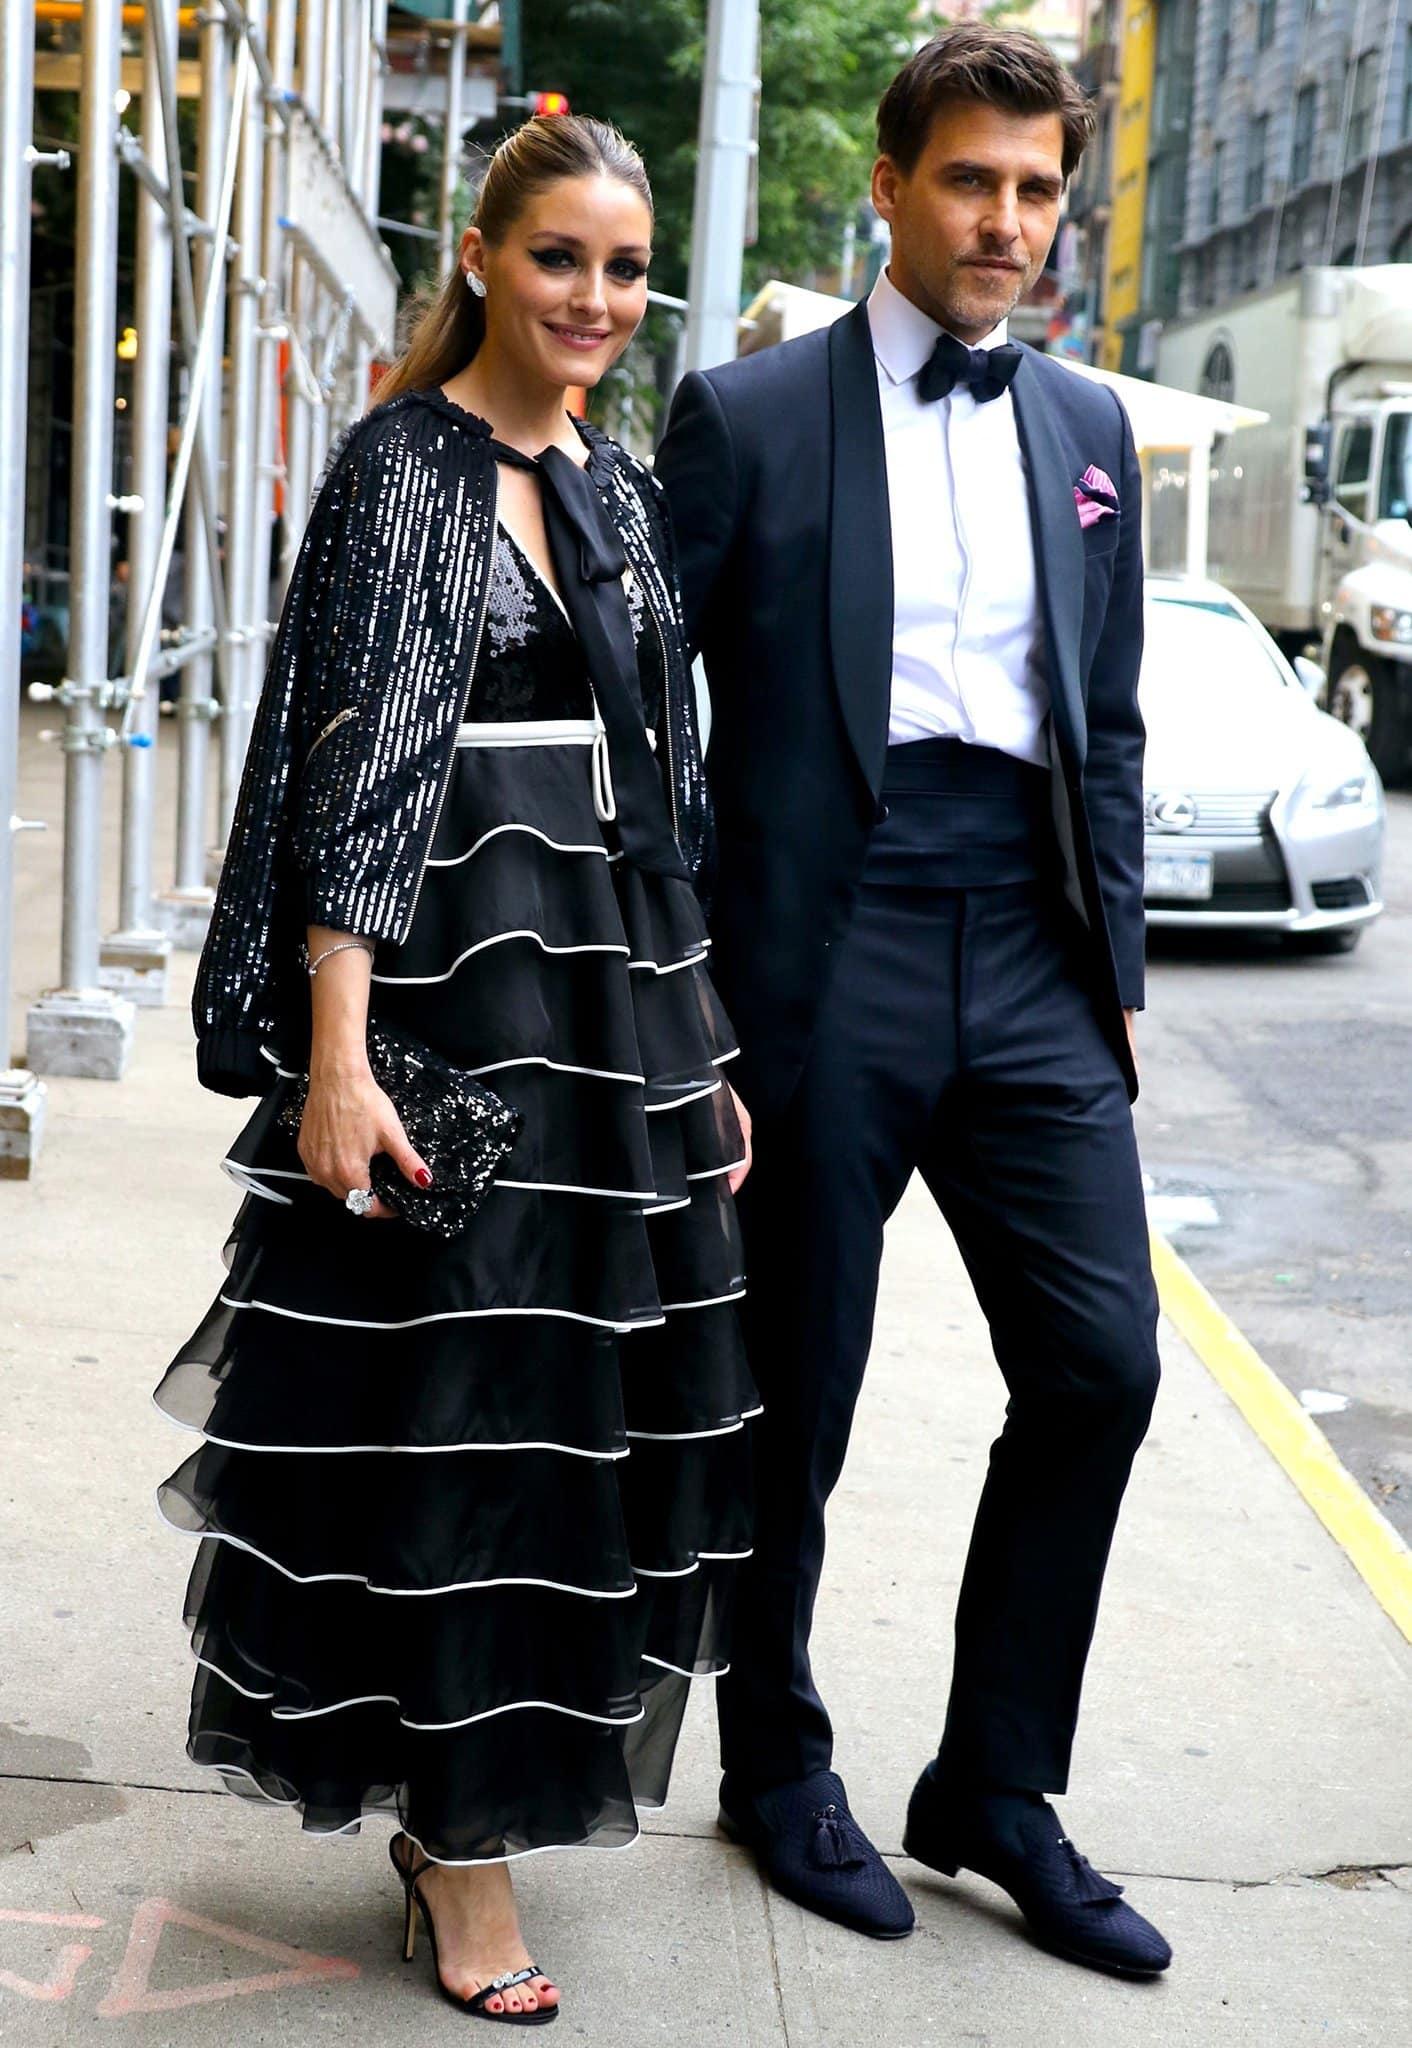 Olivia Palermo and her husband Johannes Huebl head to New York Botanical Garden spring gala